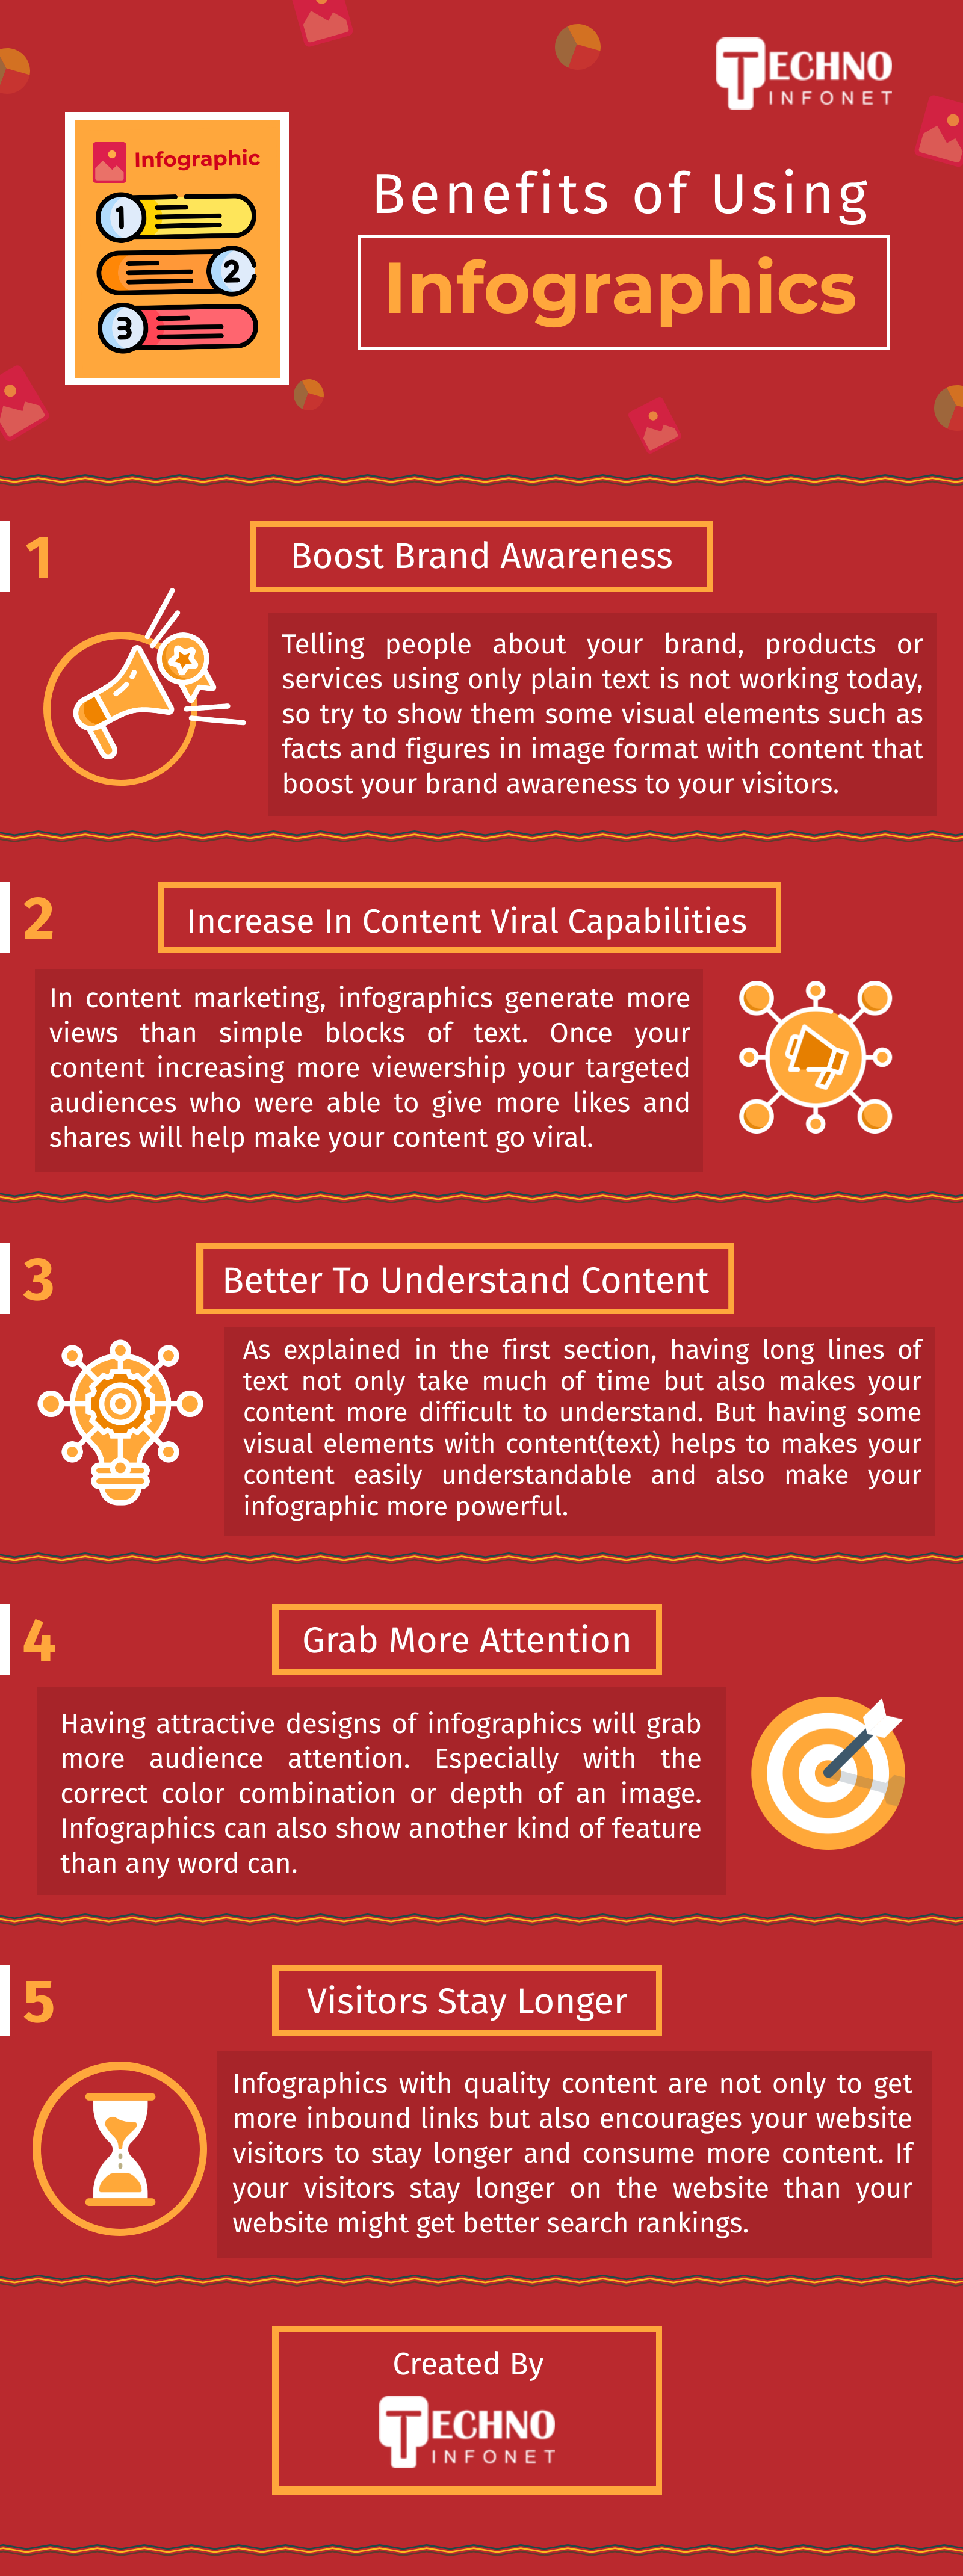 Benefits of Using Infographics